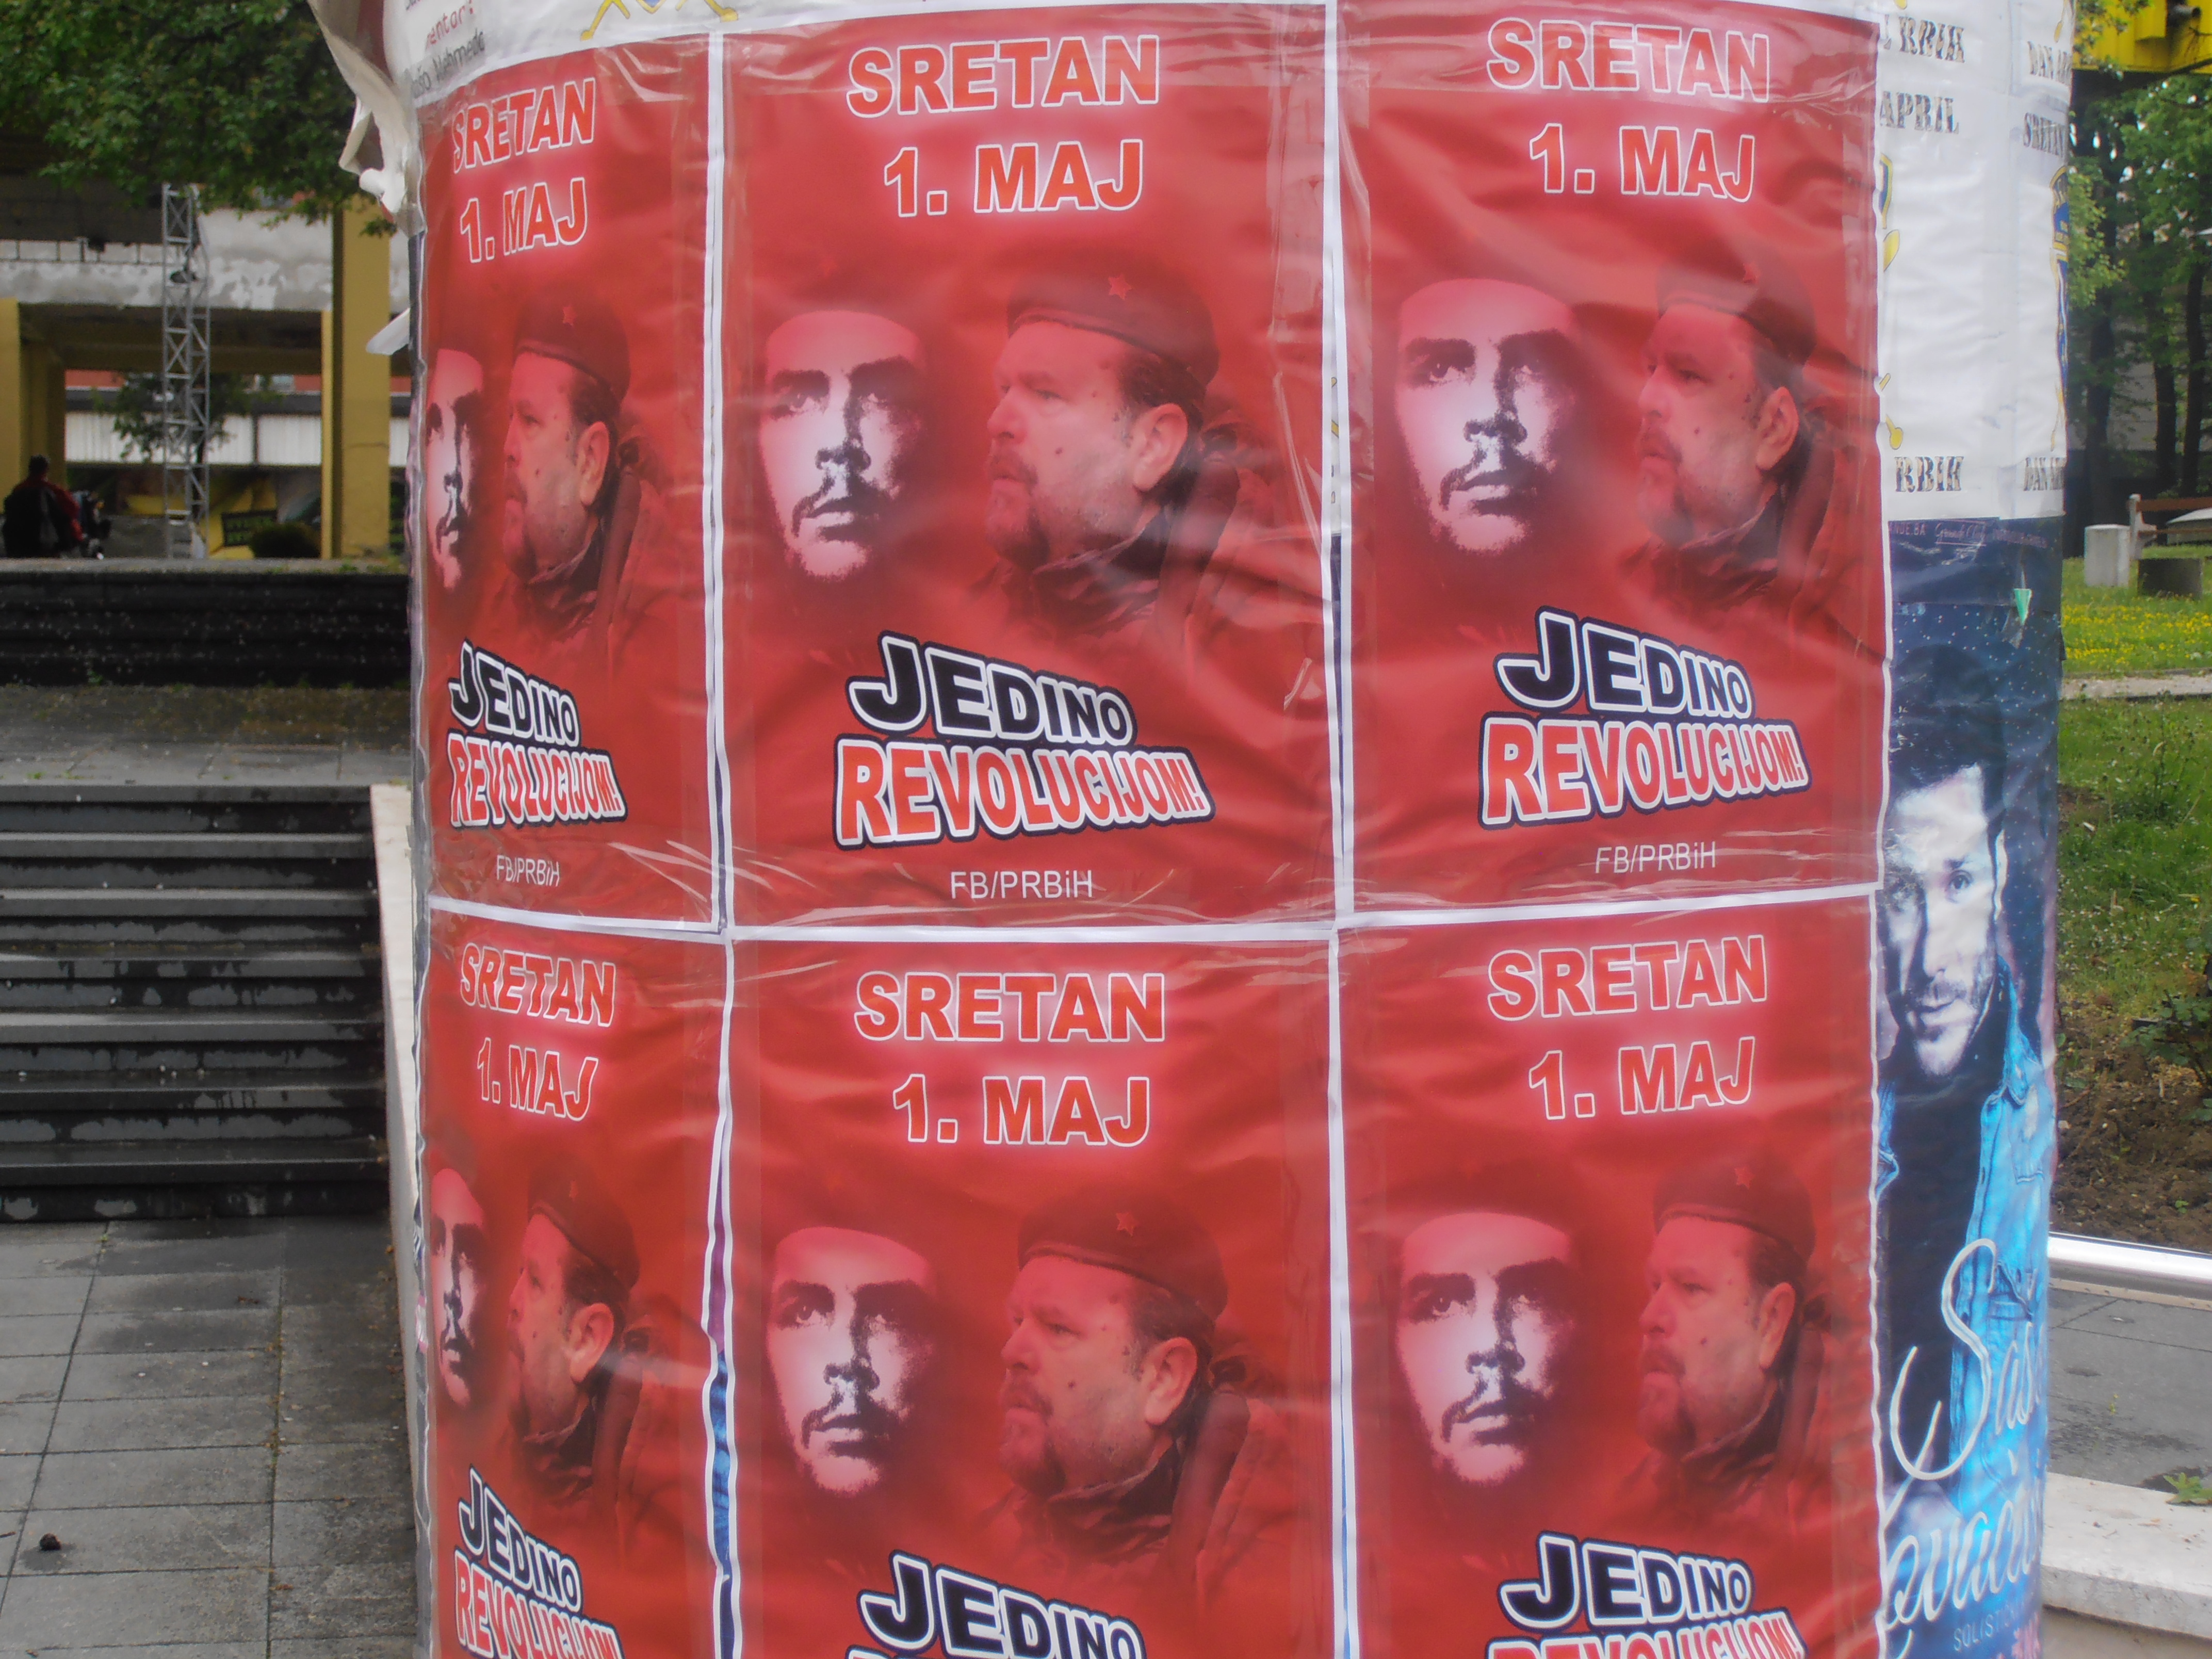 Bosnia and Herzegovina: Posters by Partija Rada